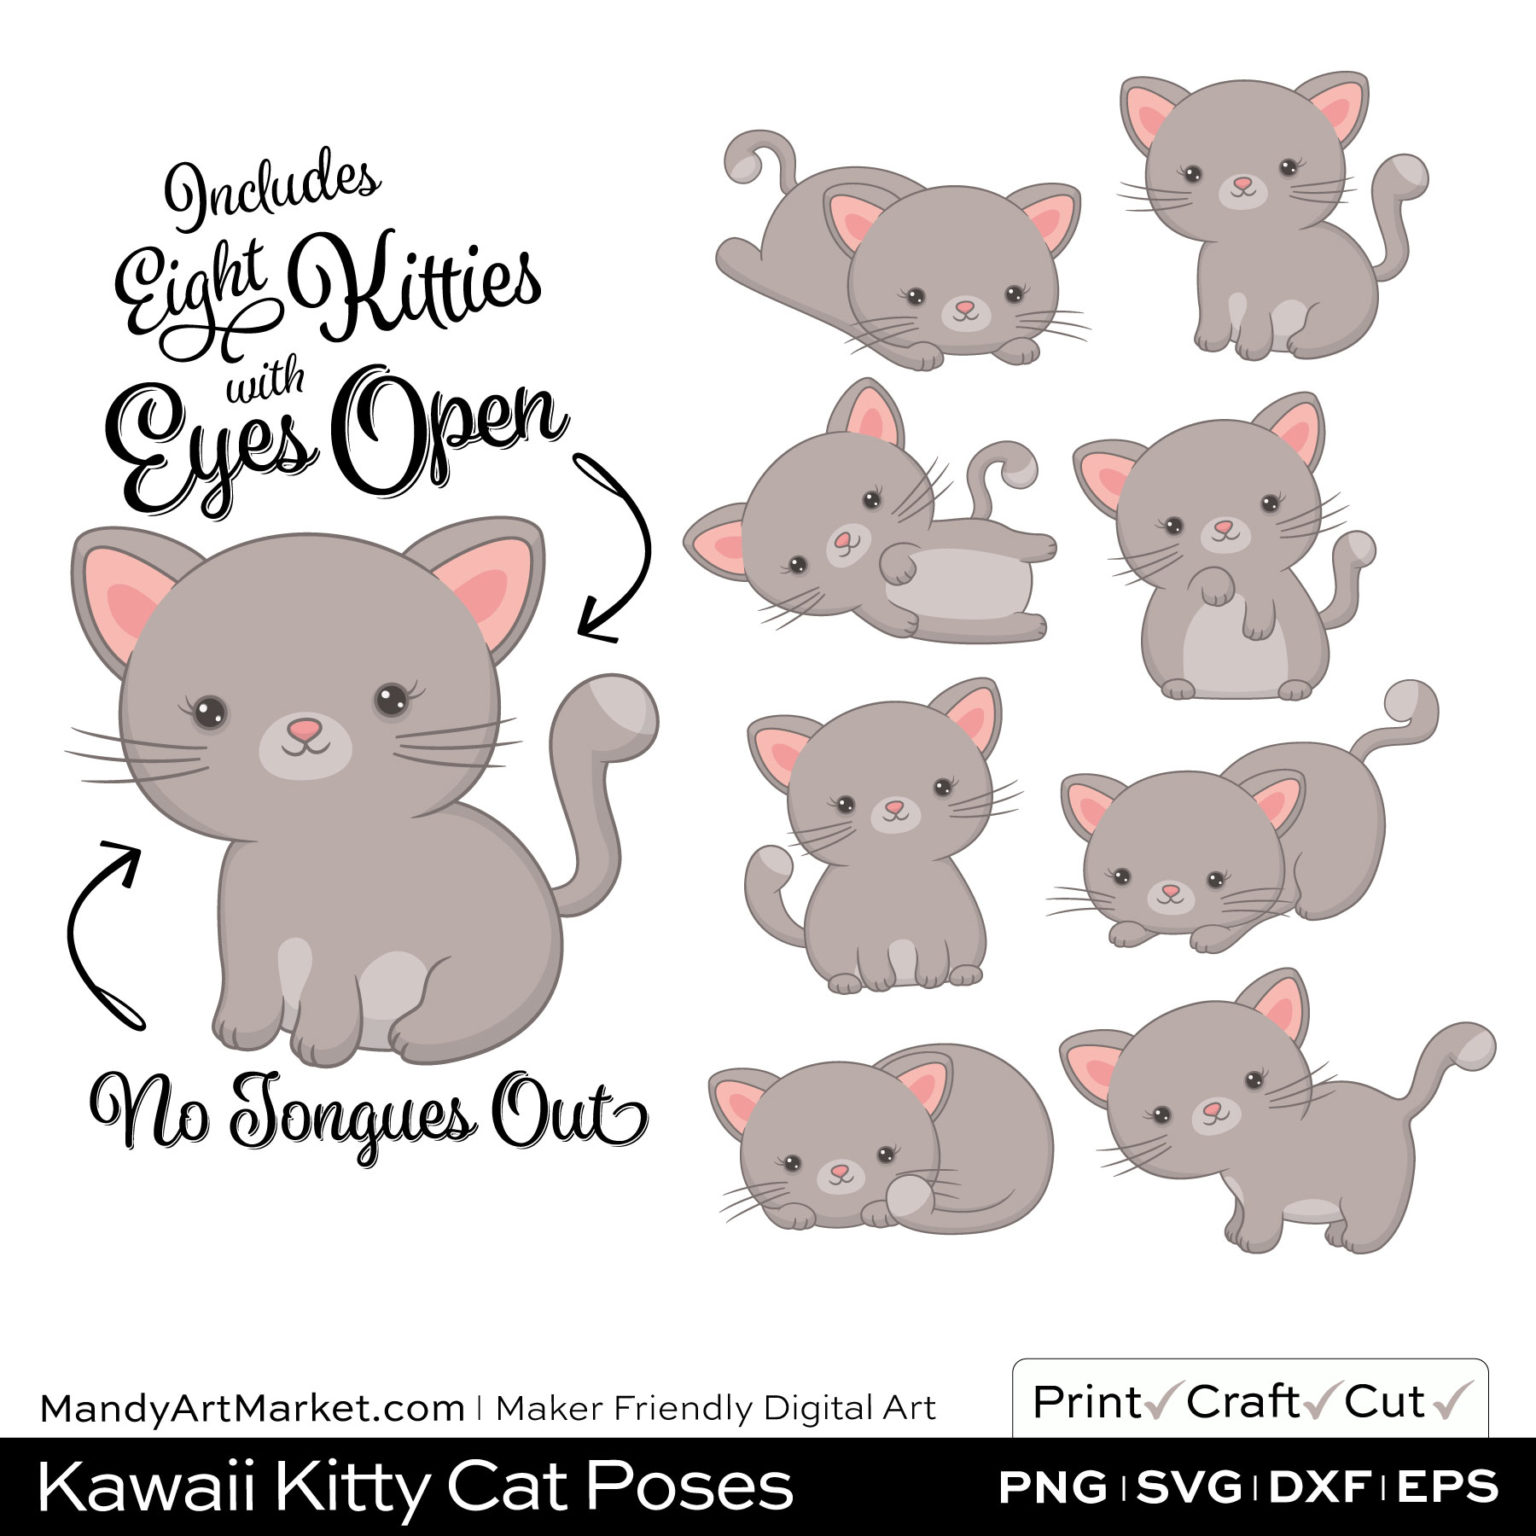 Light Fog Gray Kawaii Kitty Cat Poses Clipart on Wood Background